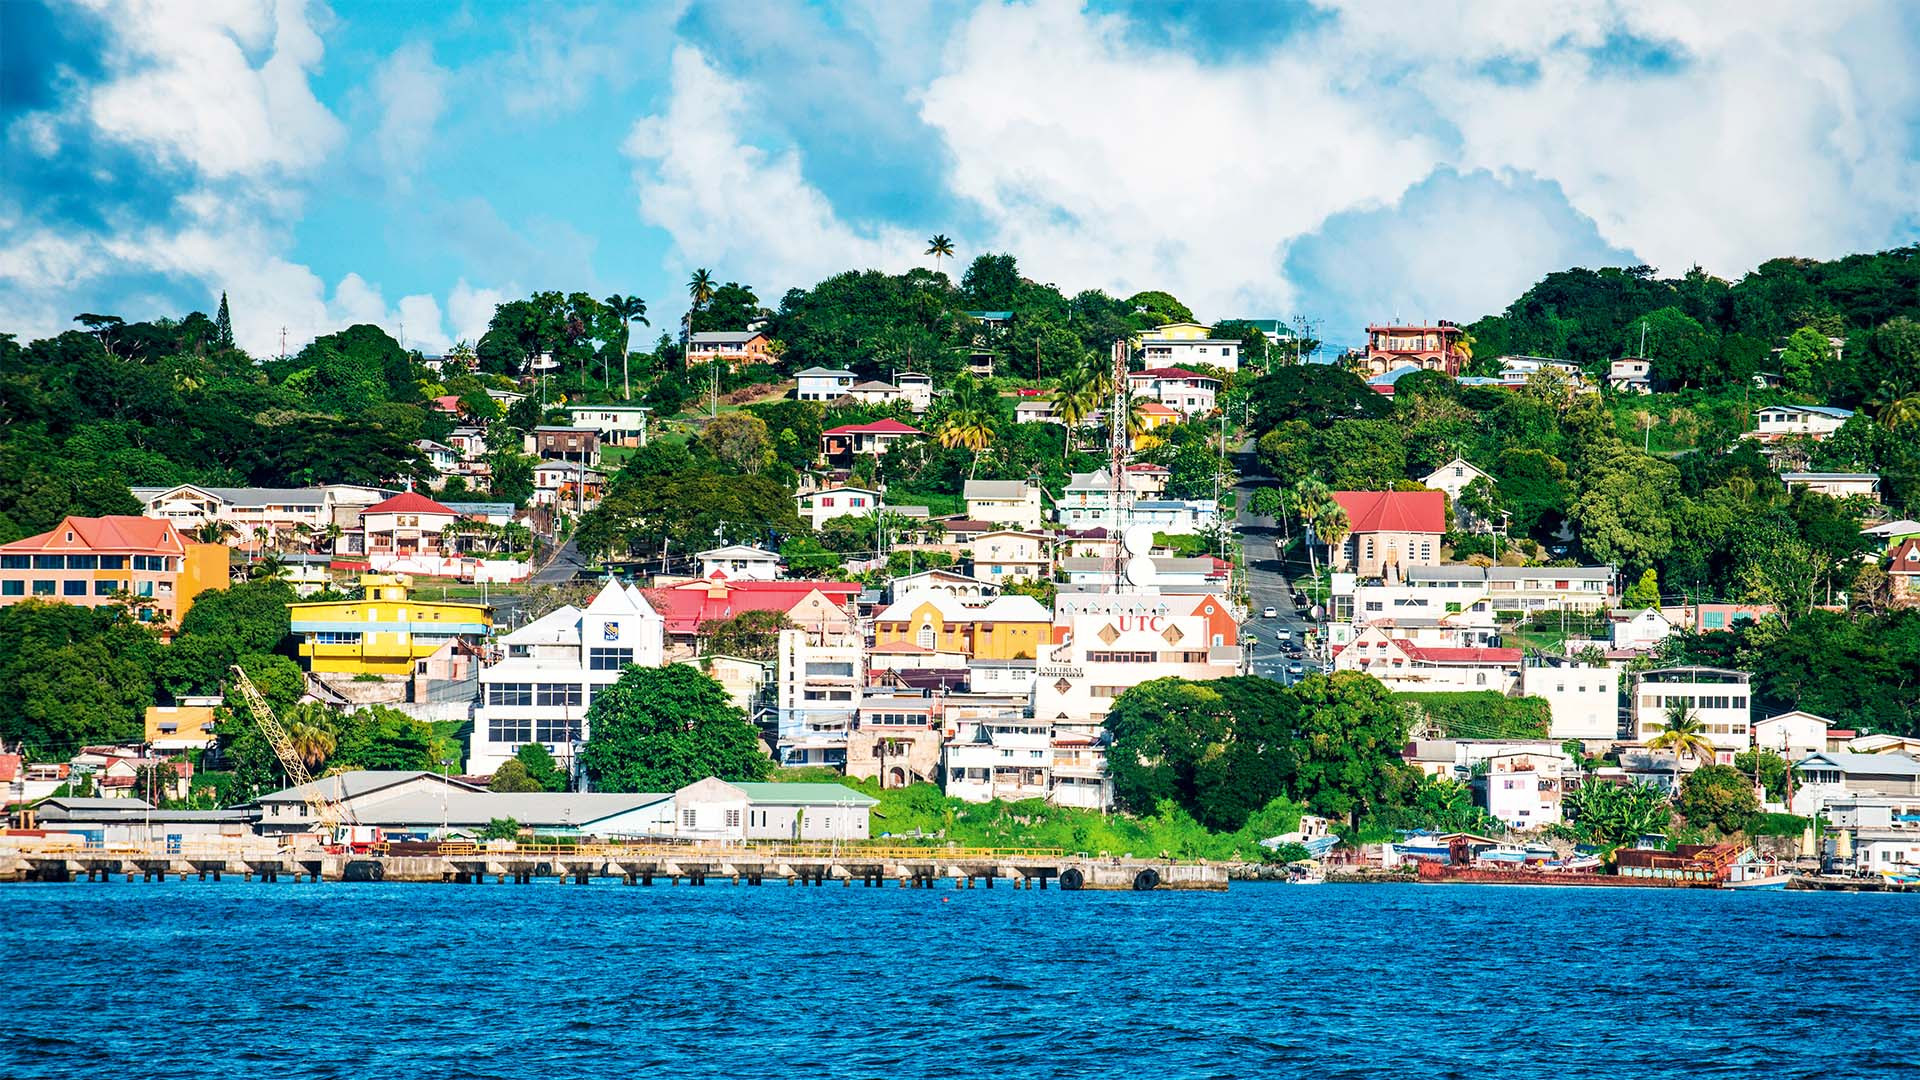 10 Best Caribbean Islands for Spring Break - Coastal Living |Trinidad And Tobago Culture Islands